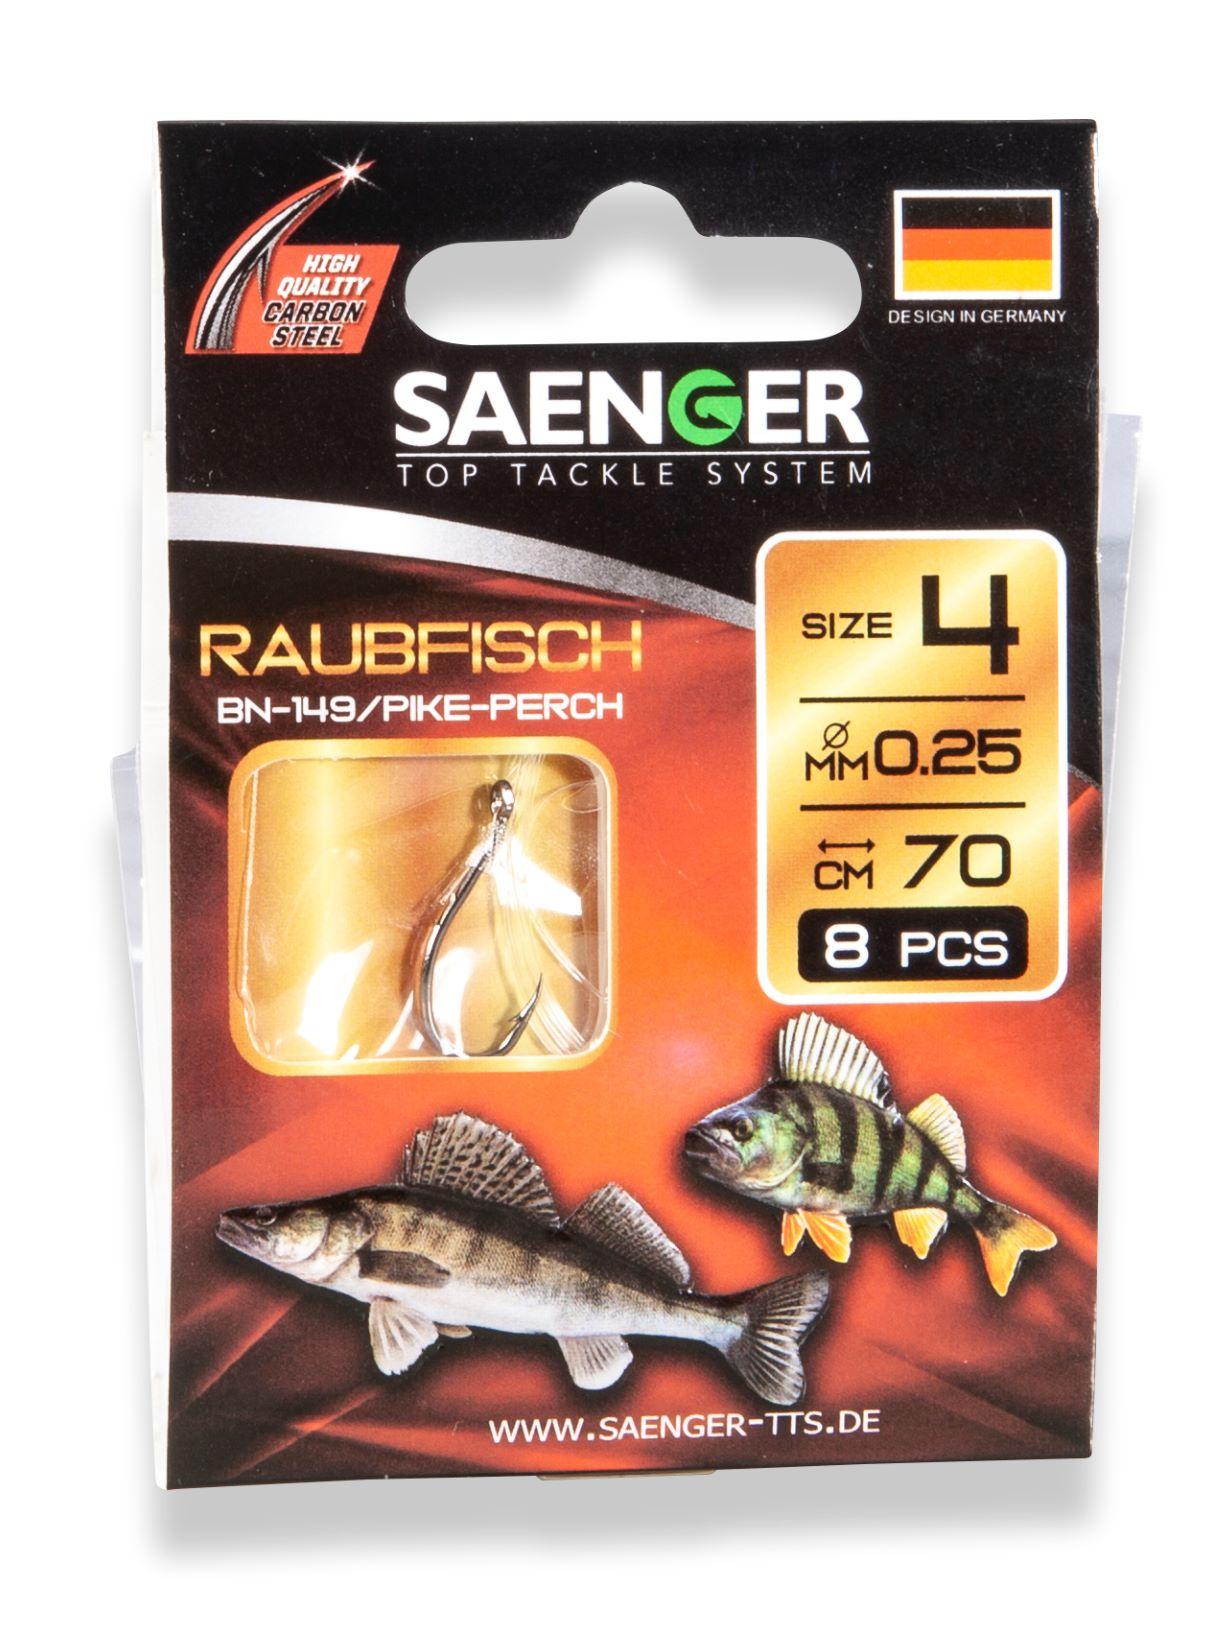 Saenger Návazec na chytání dravých ryb Raubfisch vel. 4, 8 ks/bal